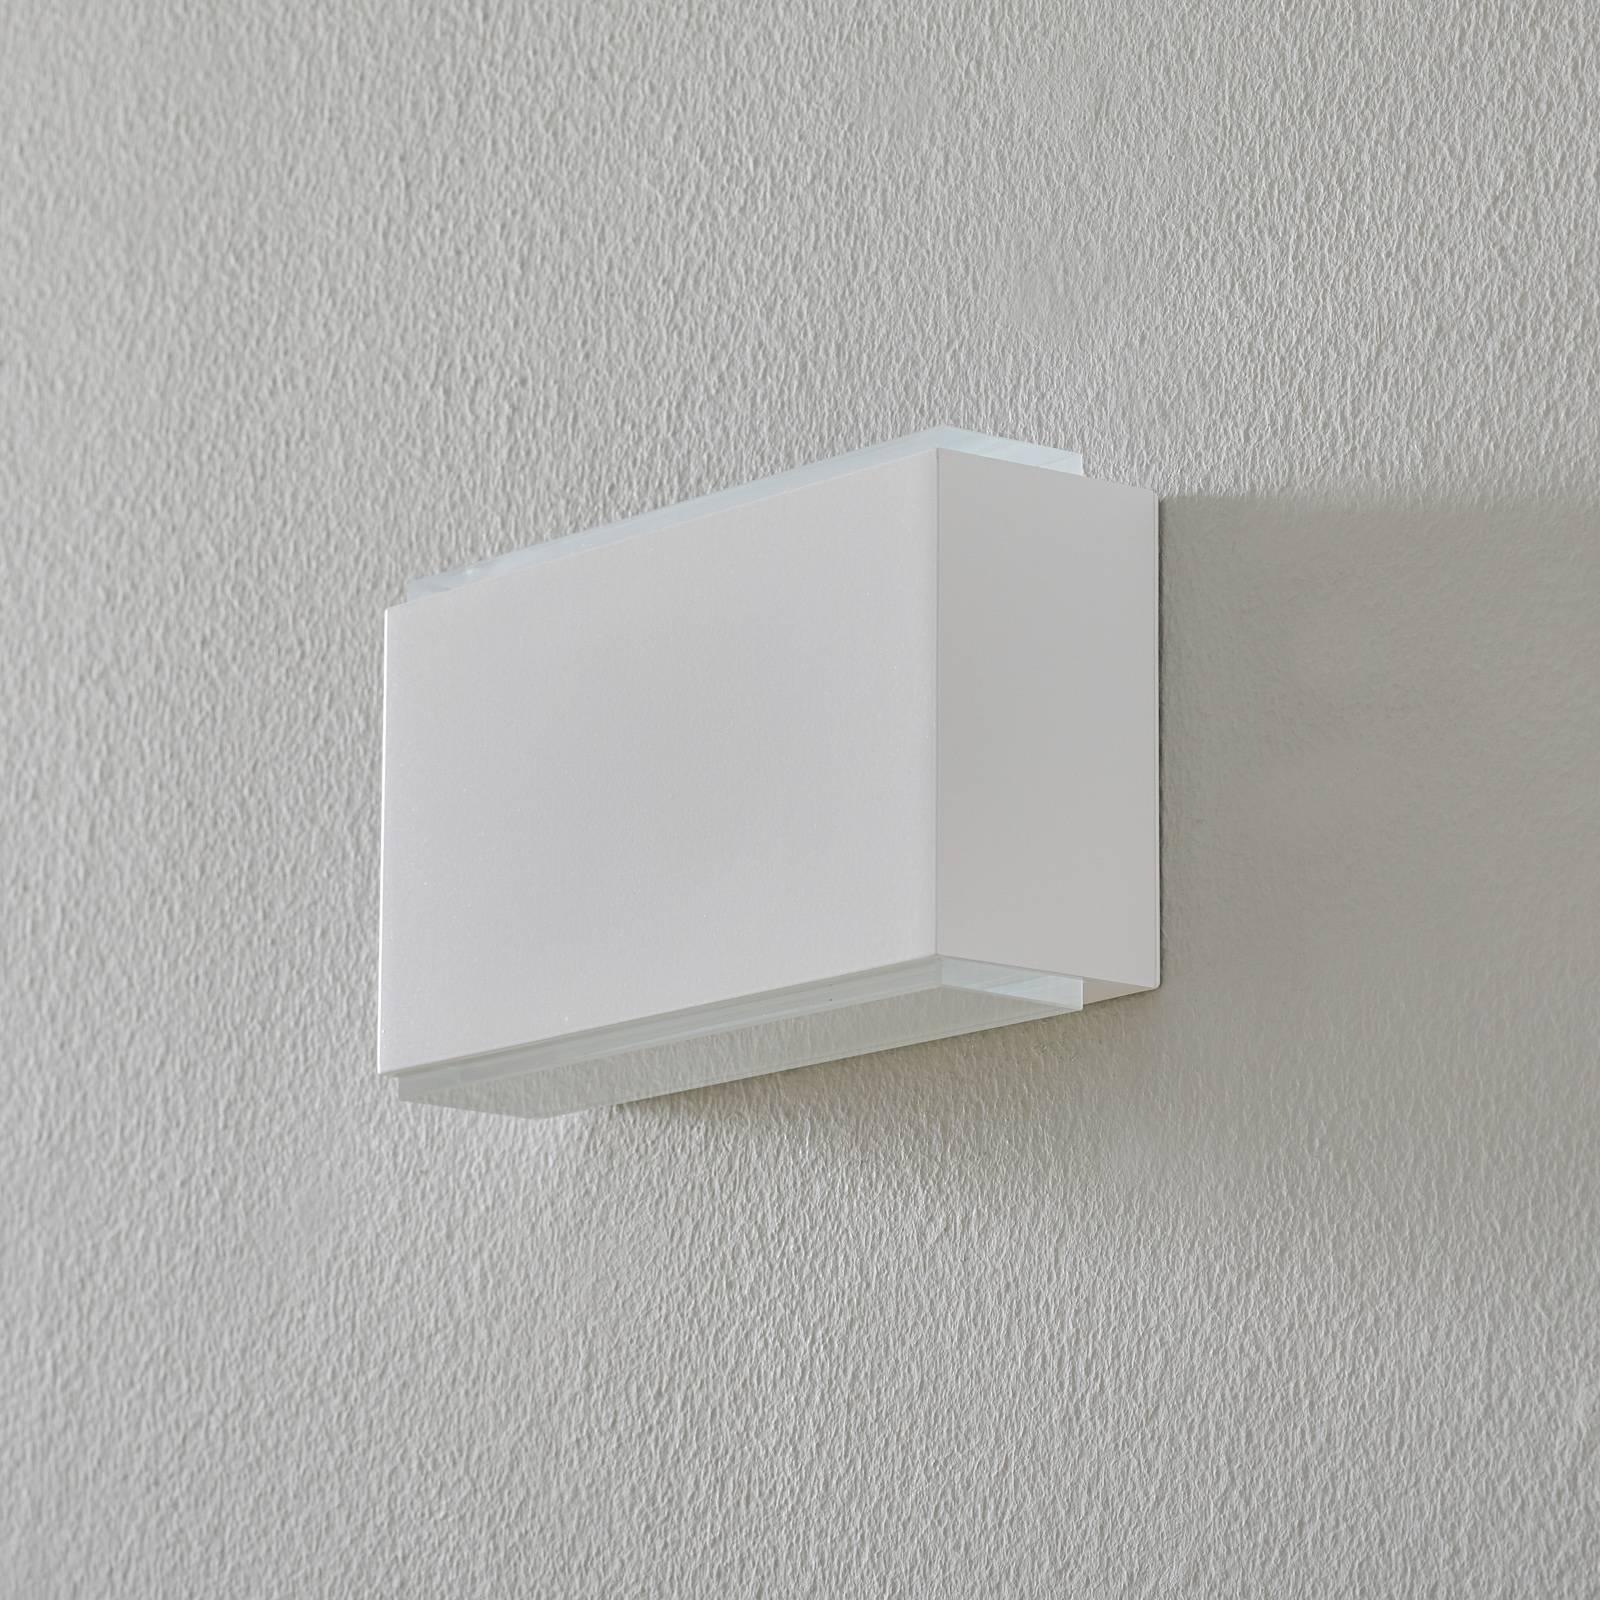 BEGA 50072 LED-seinälamppu 18cm valkoinen 1630lm